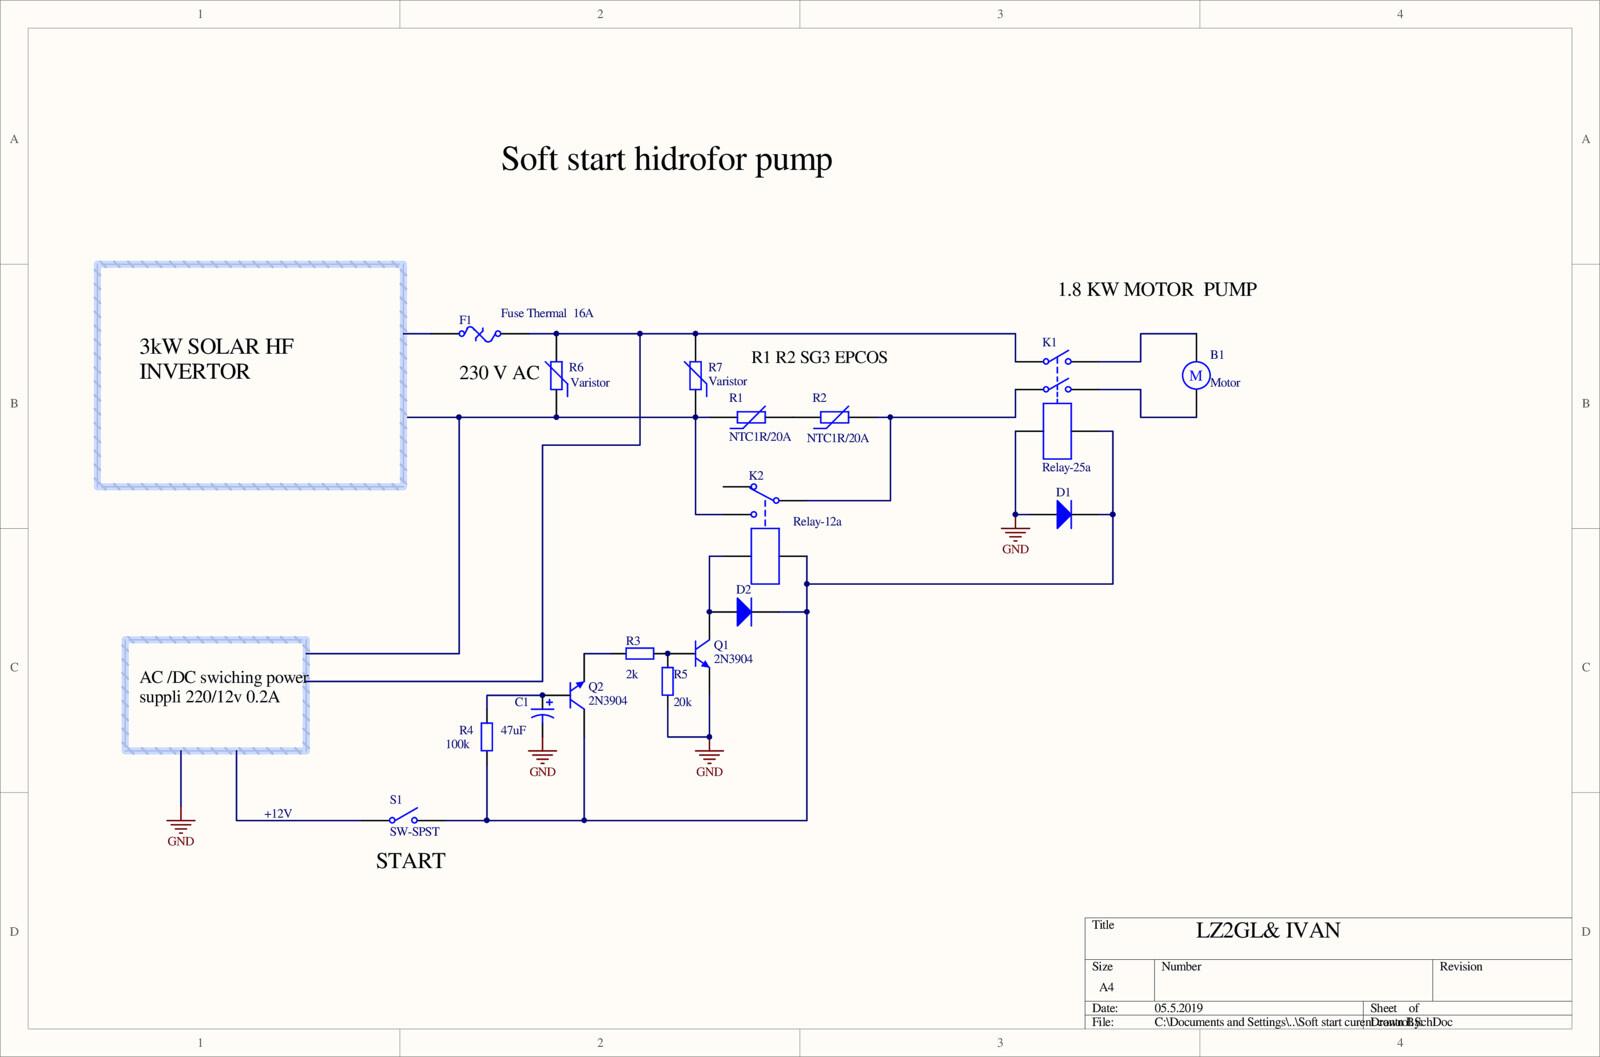 hight resolution of soft start motor pump schematic